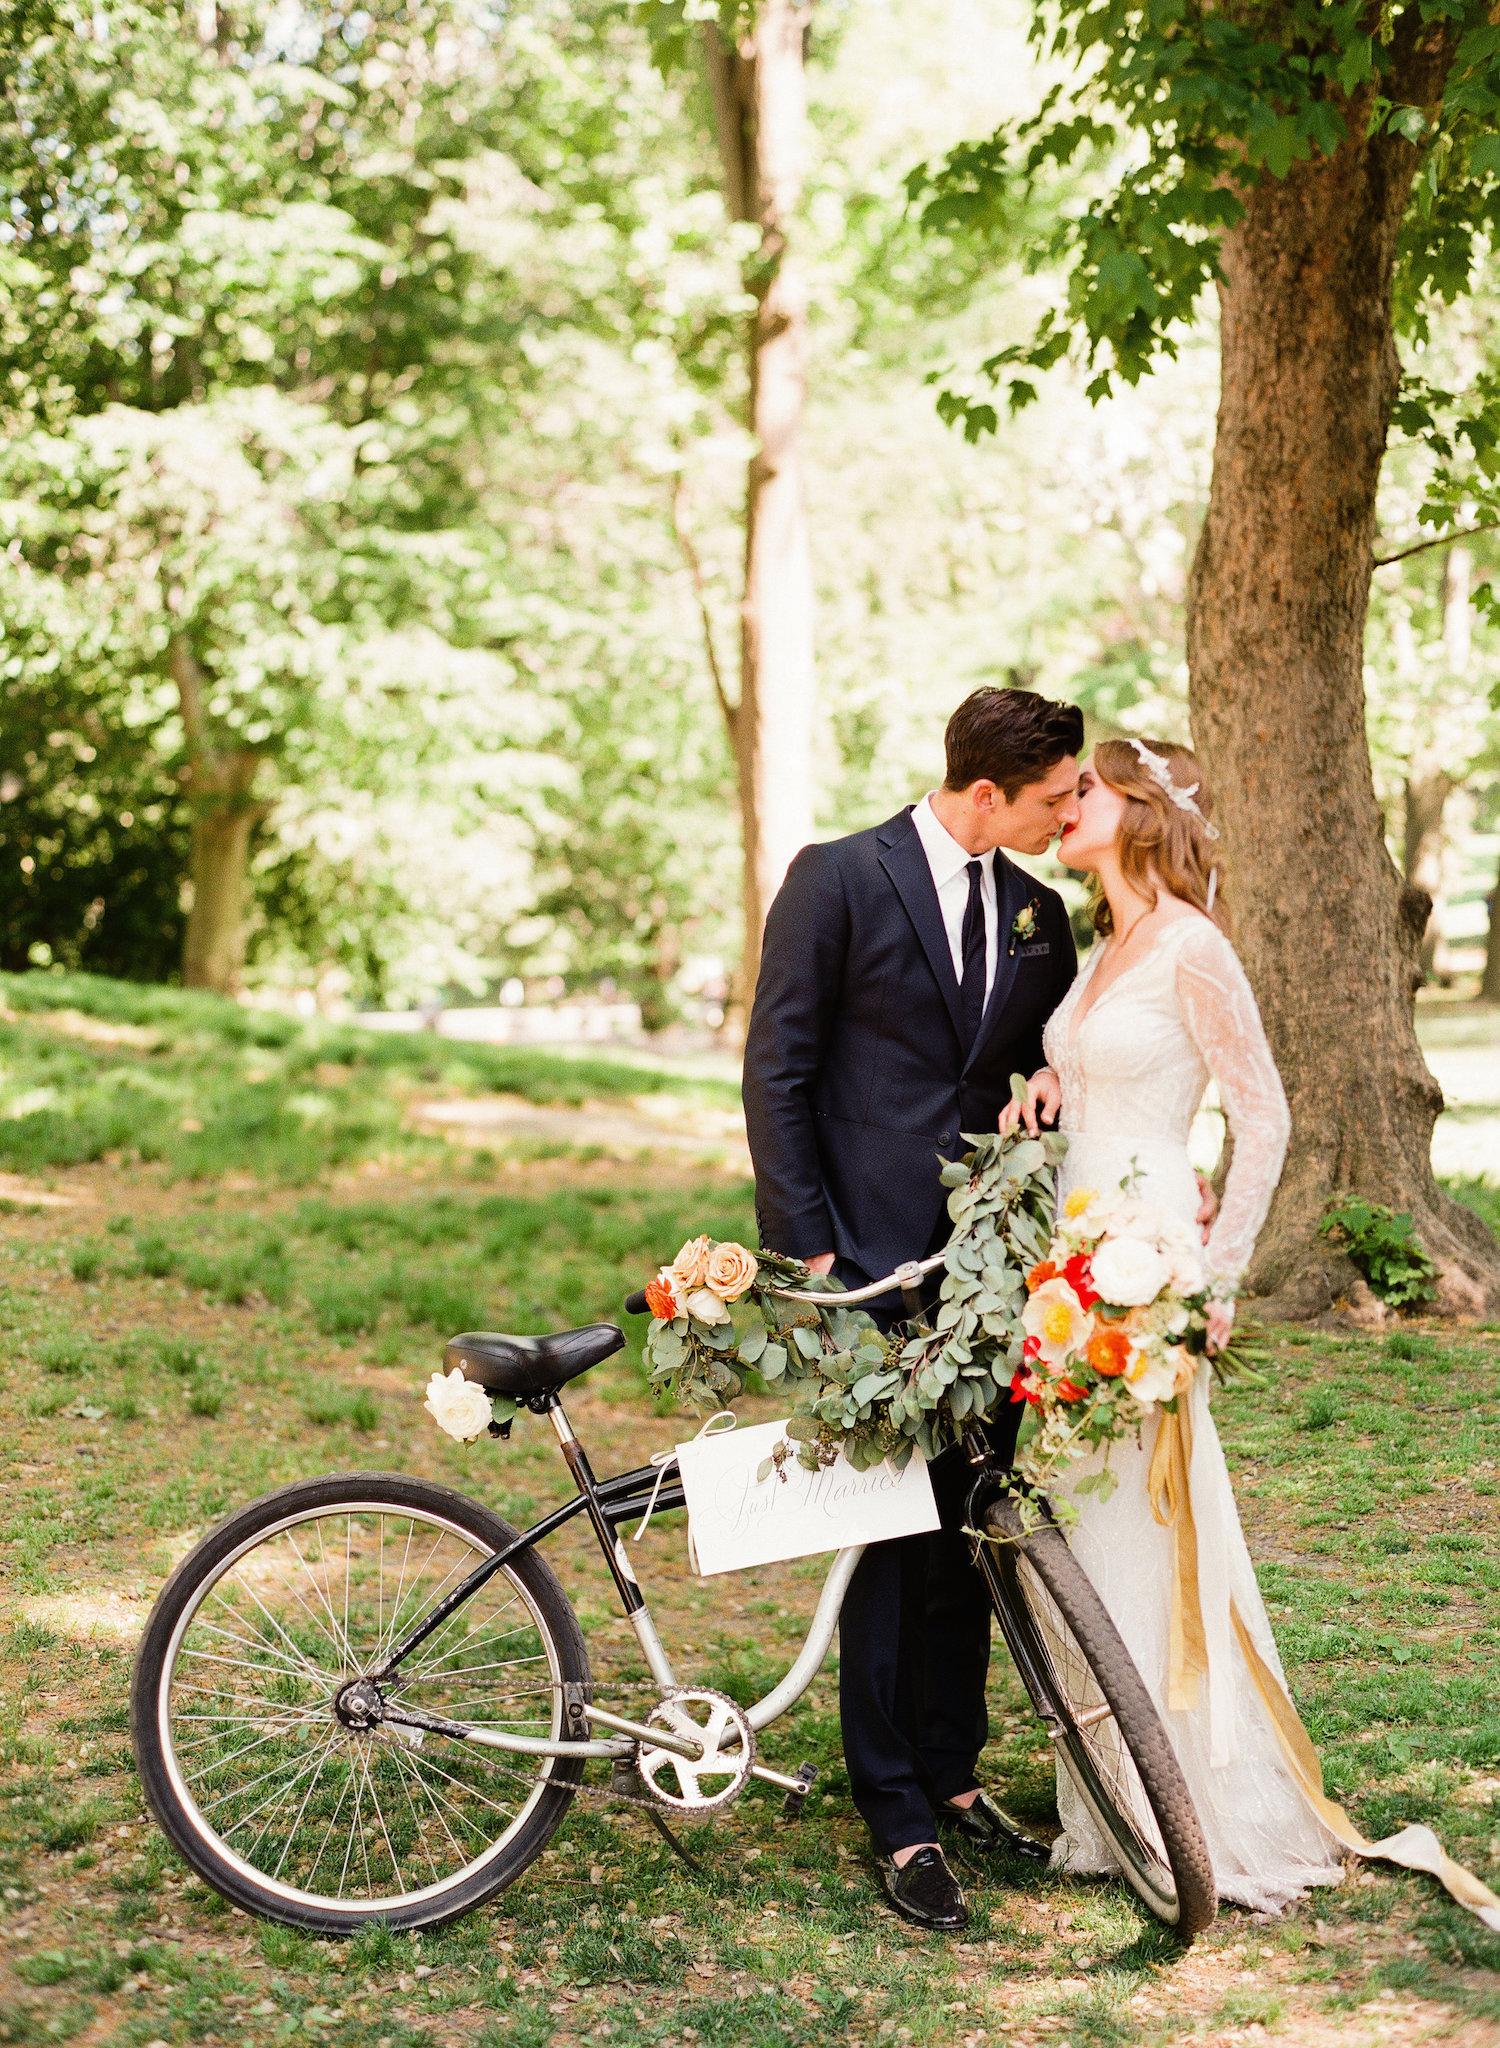 Morning Glow - Full Aperture Floral & Lindsay Madden Photography 128.jpeg